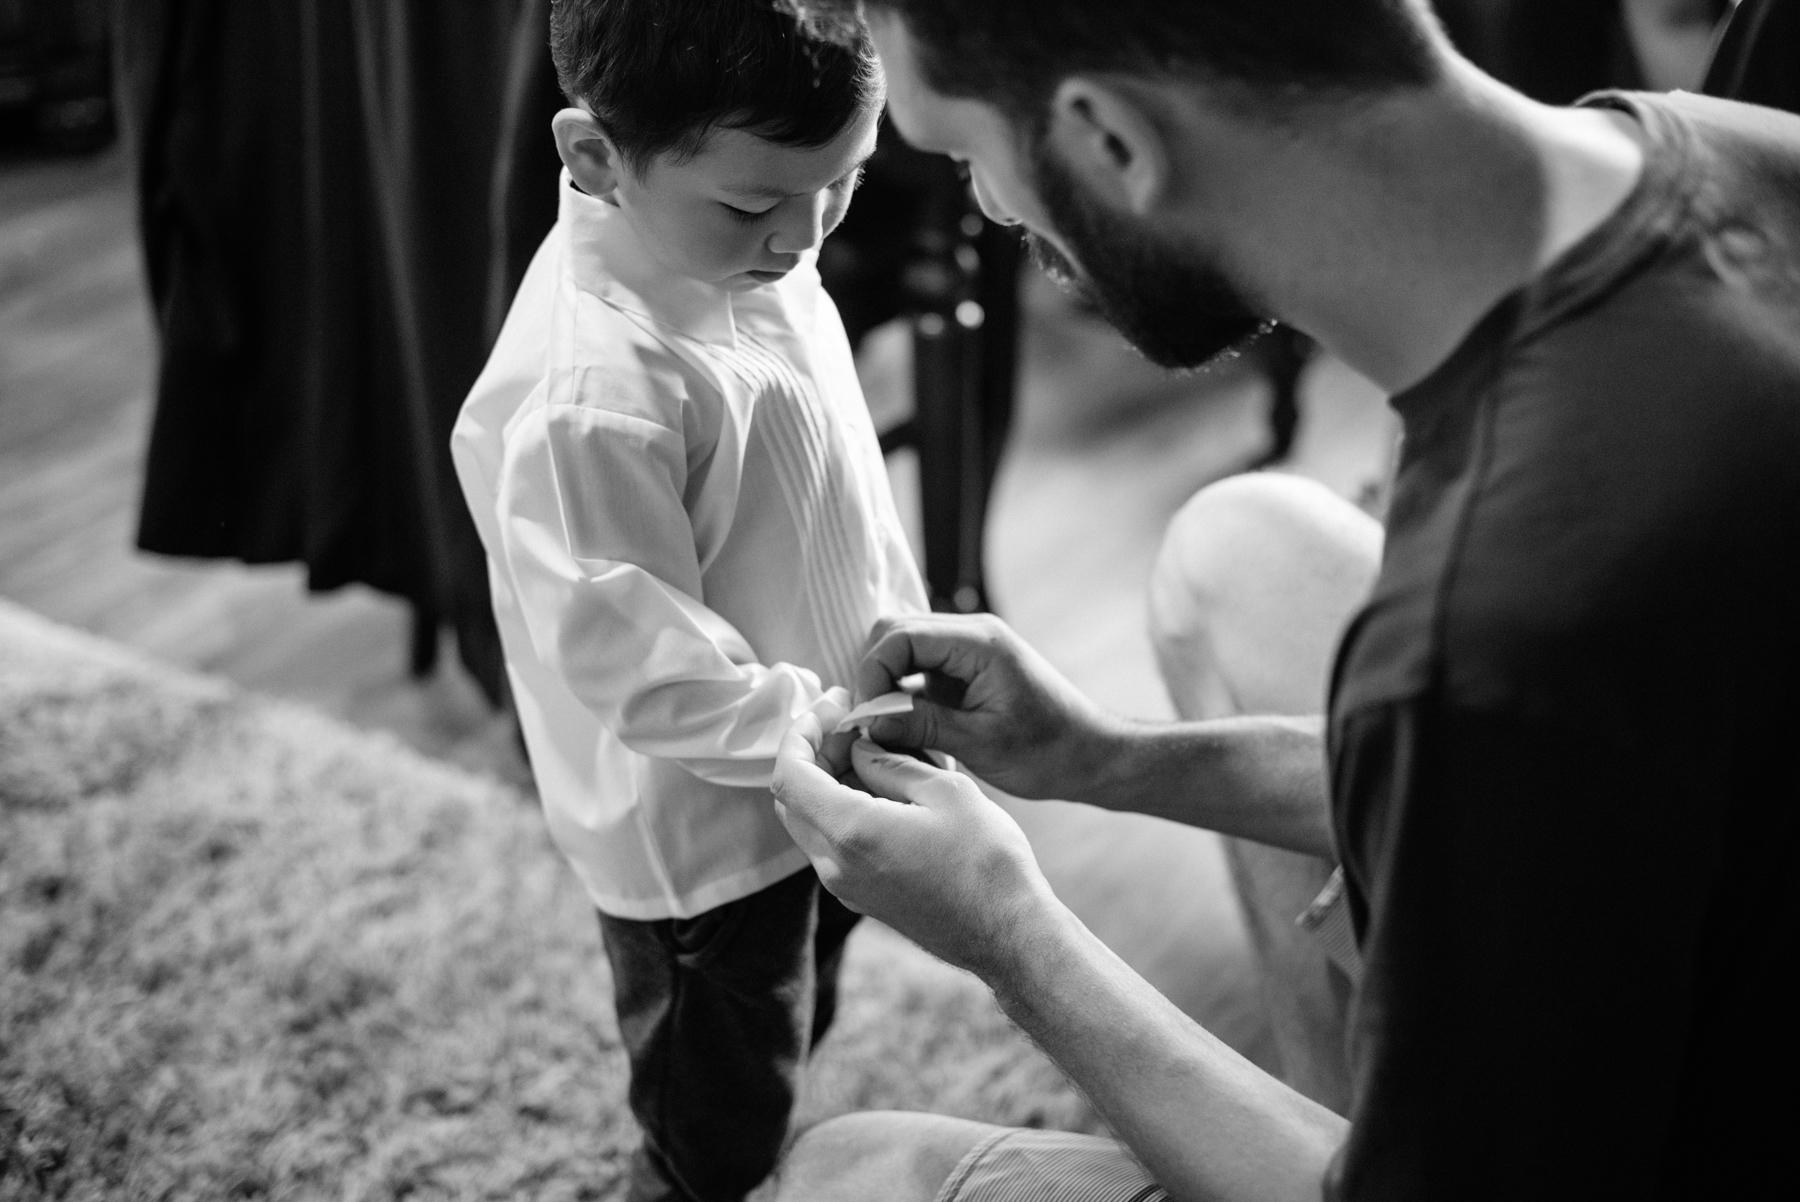 Secret Garden Event Center Wedding - Meredith Amadee Photography-17.jpg